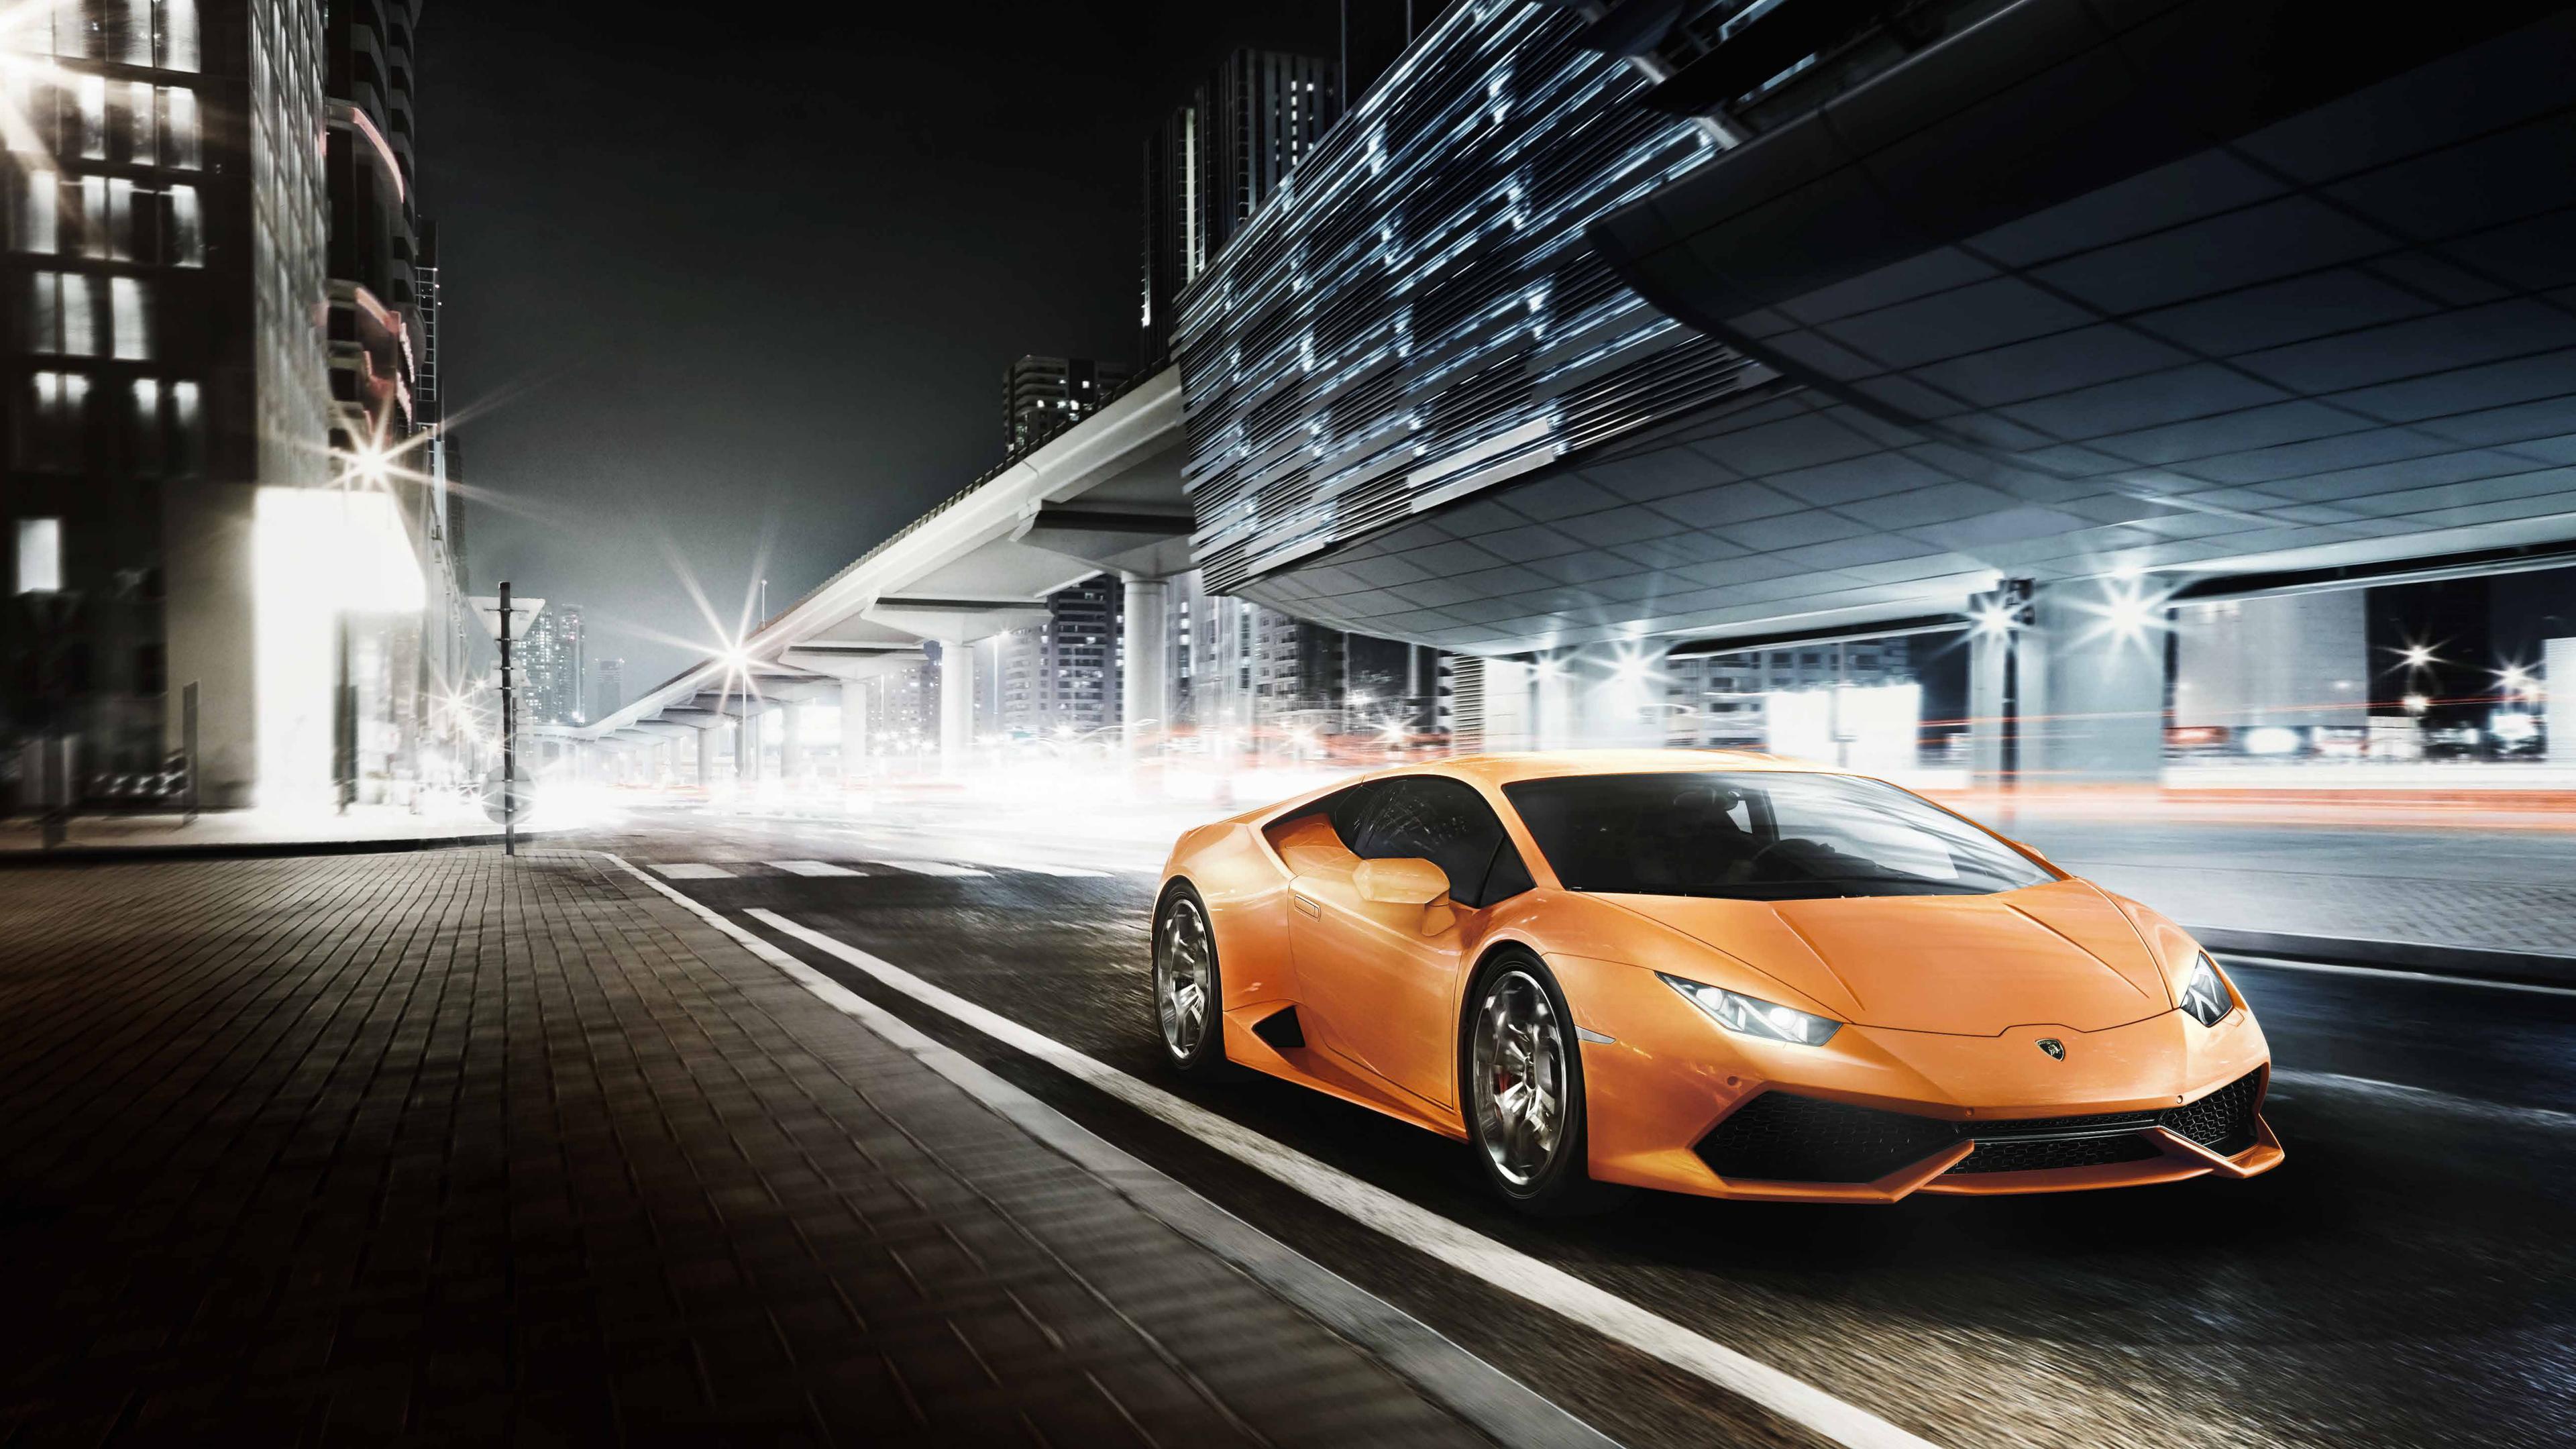 orange lamborghini huracan 4k 1546361648 - Orange Lamborghini Huracan 4k - lamborghini wallpapers, lamborghini huracan wallpapers, hd-wallpapers, cars wallpapers, 8k wallpapers, 5k wallpapers, 4k-wallpapers